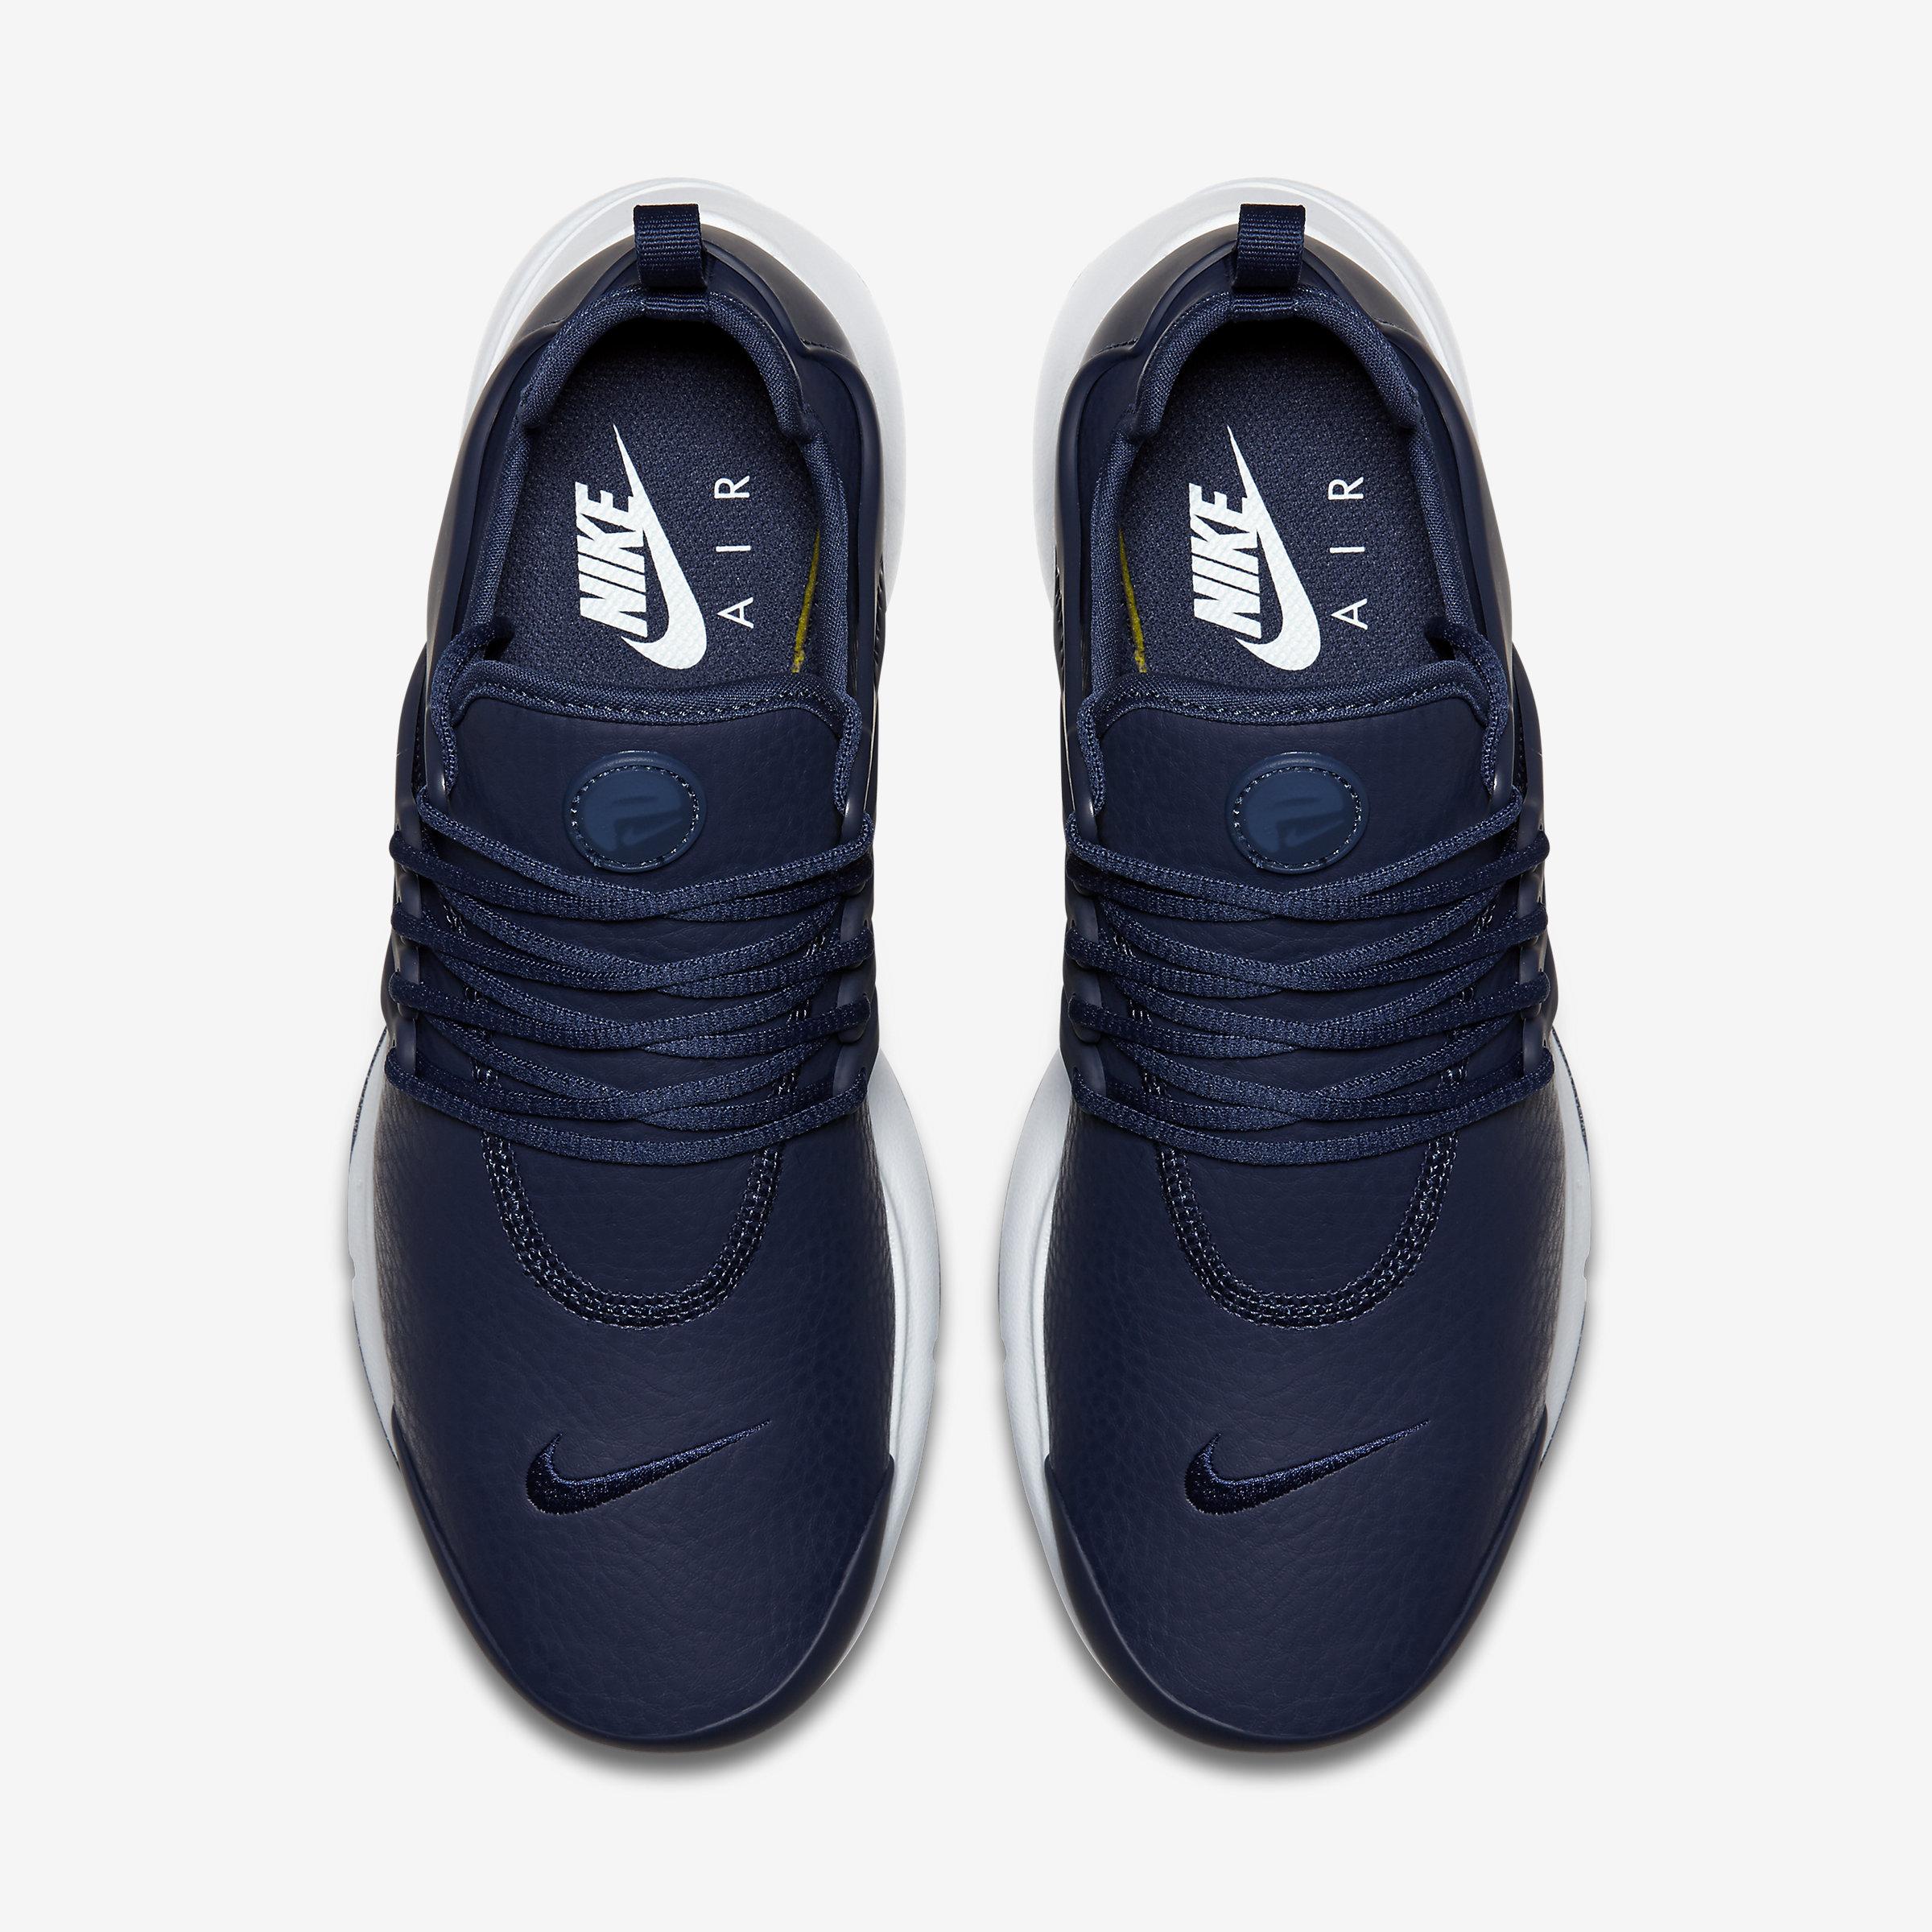 Nike Leather Air Presto Premium in Midnight Navy,Midnight Navy (Blue) for Men